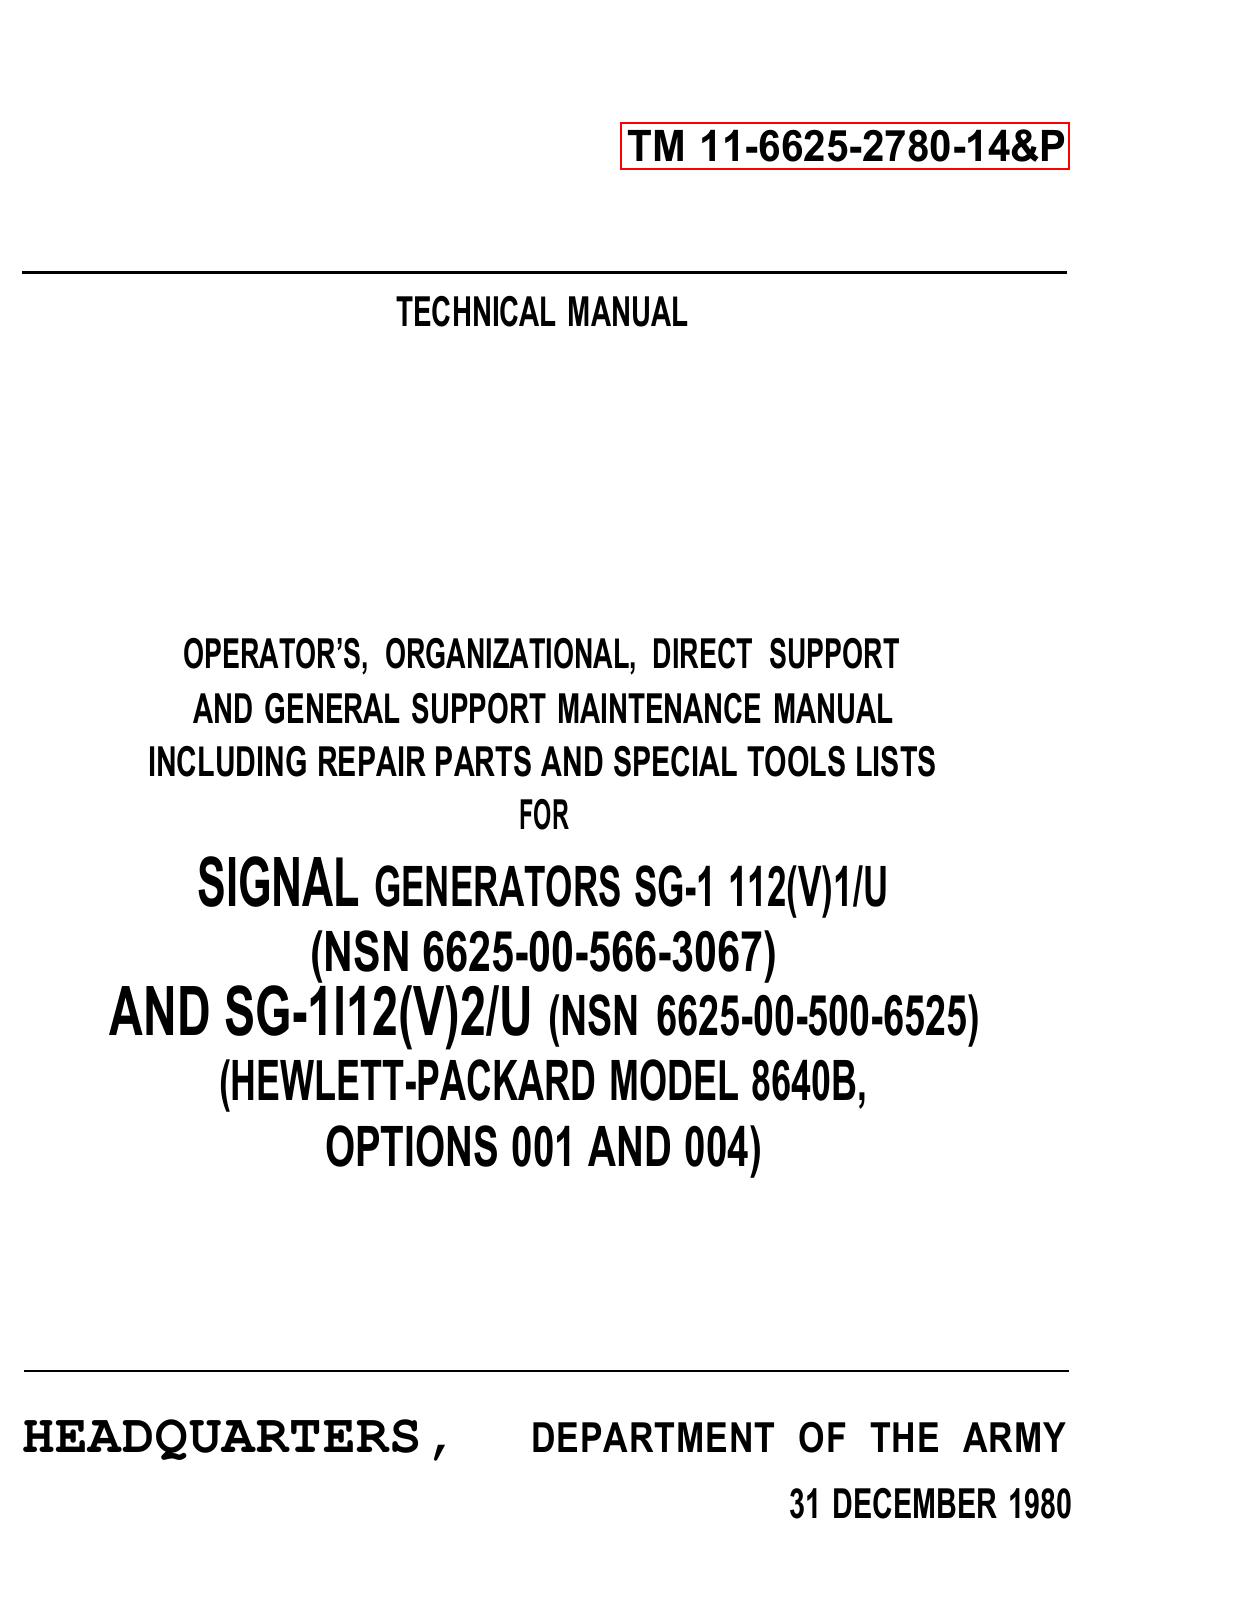 HEWLETT-PACKARD MODEL 8640B, O | manualzz com